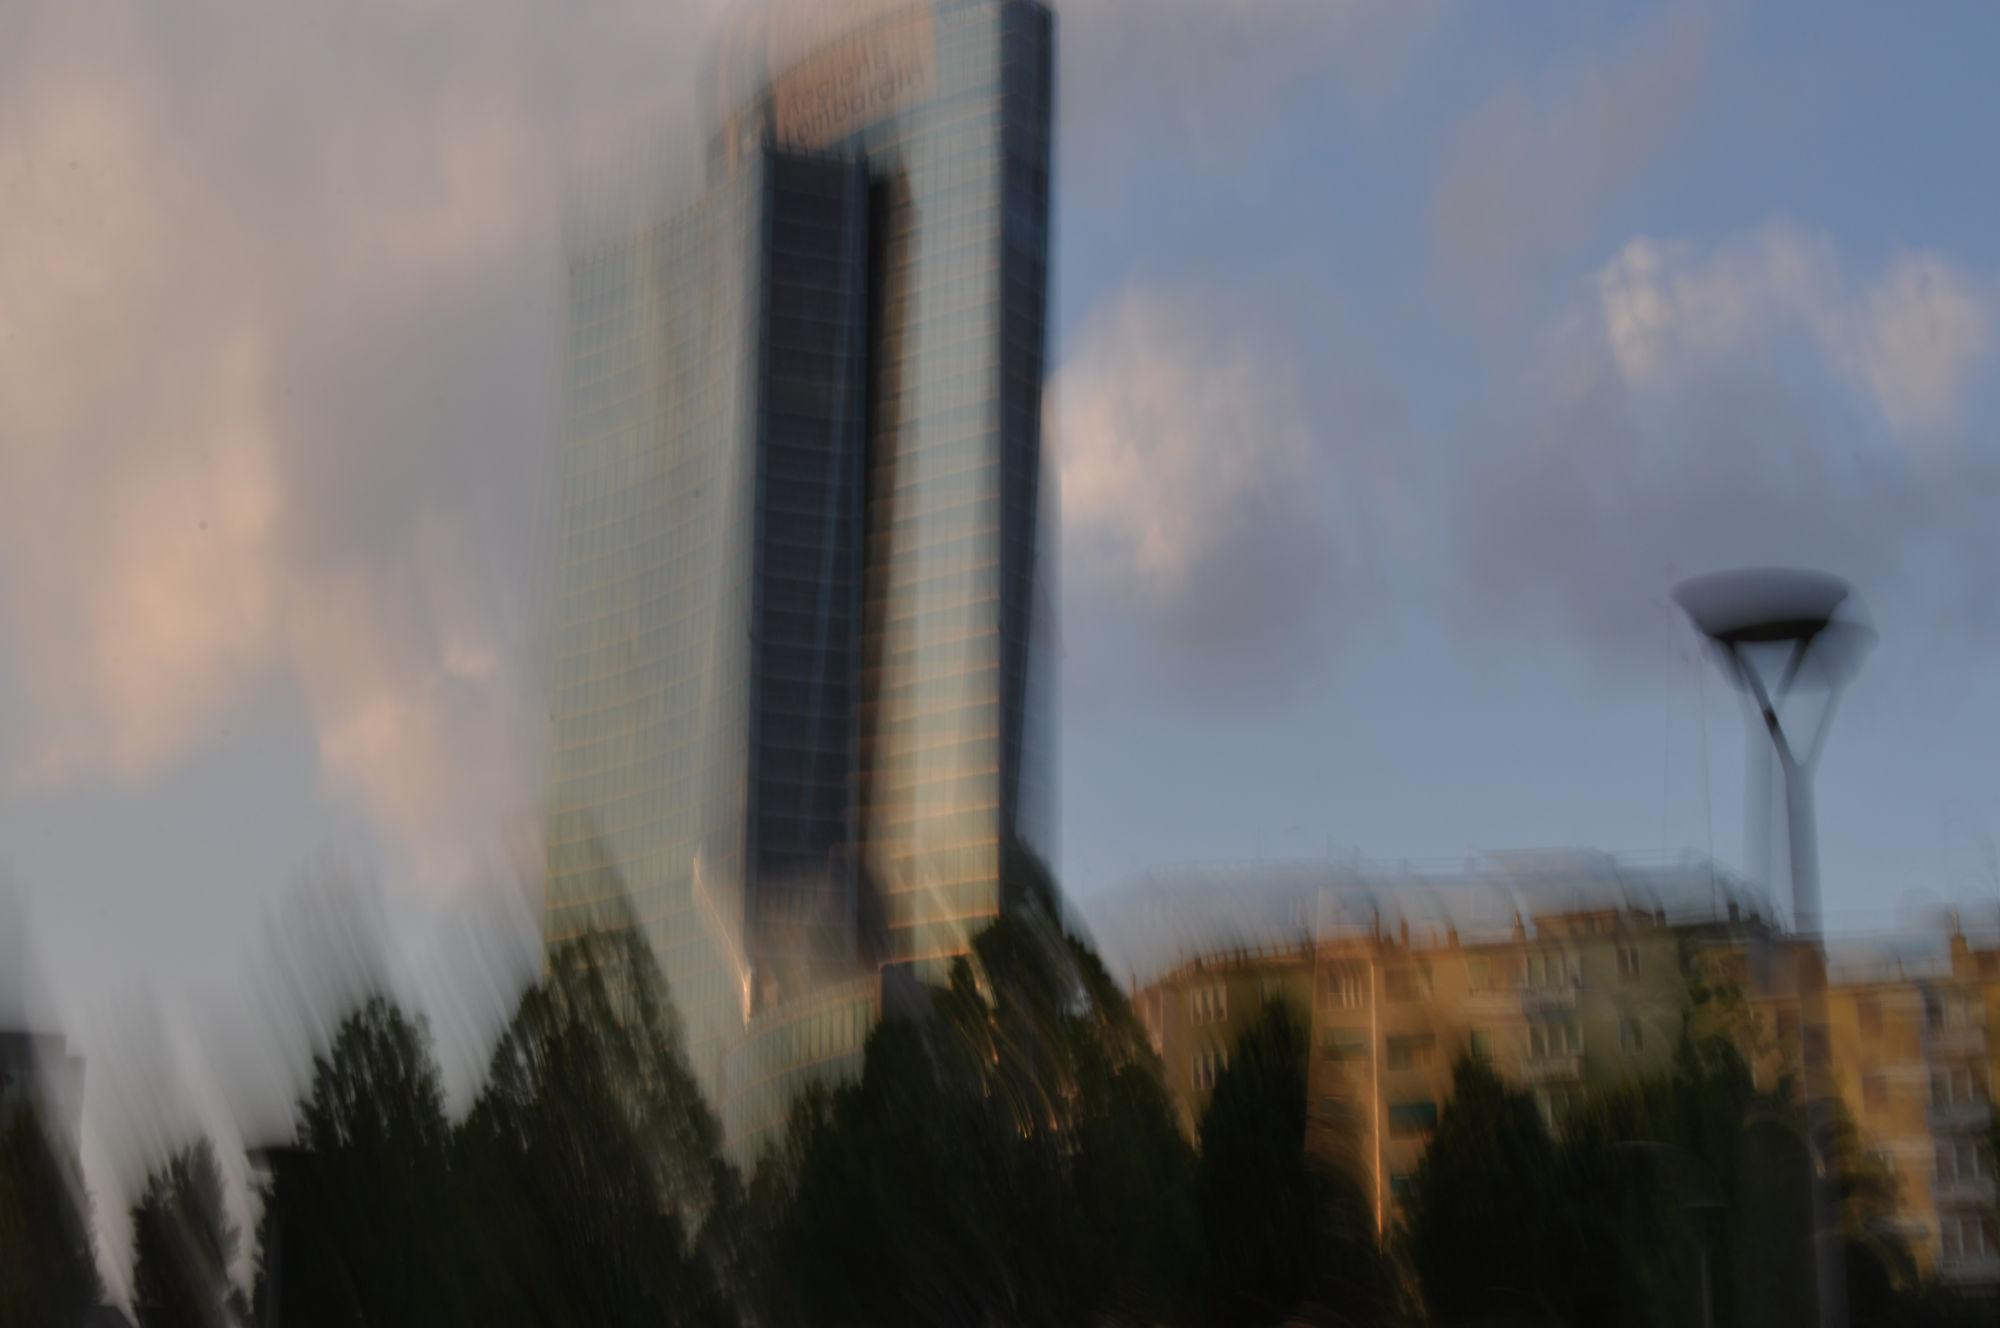 foto mosse milano regione lombardia 2020 0060b